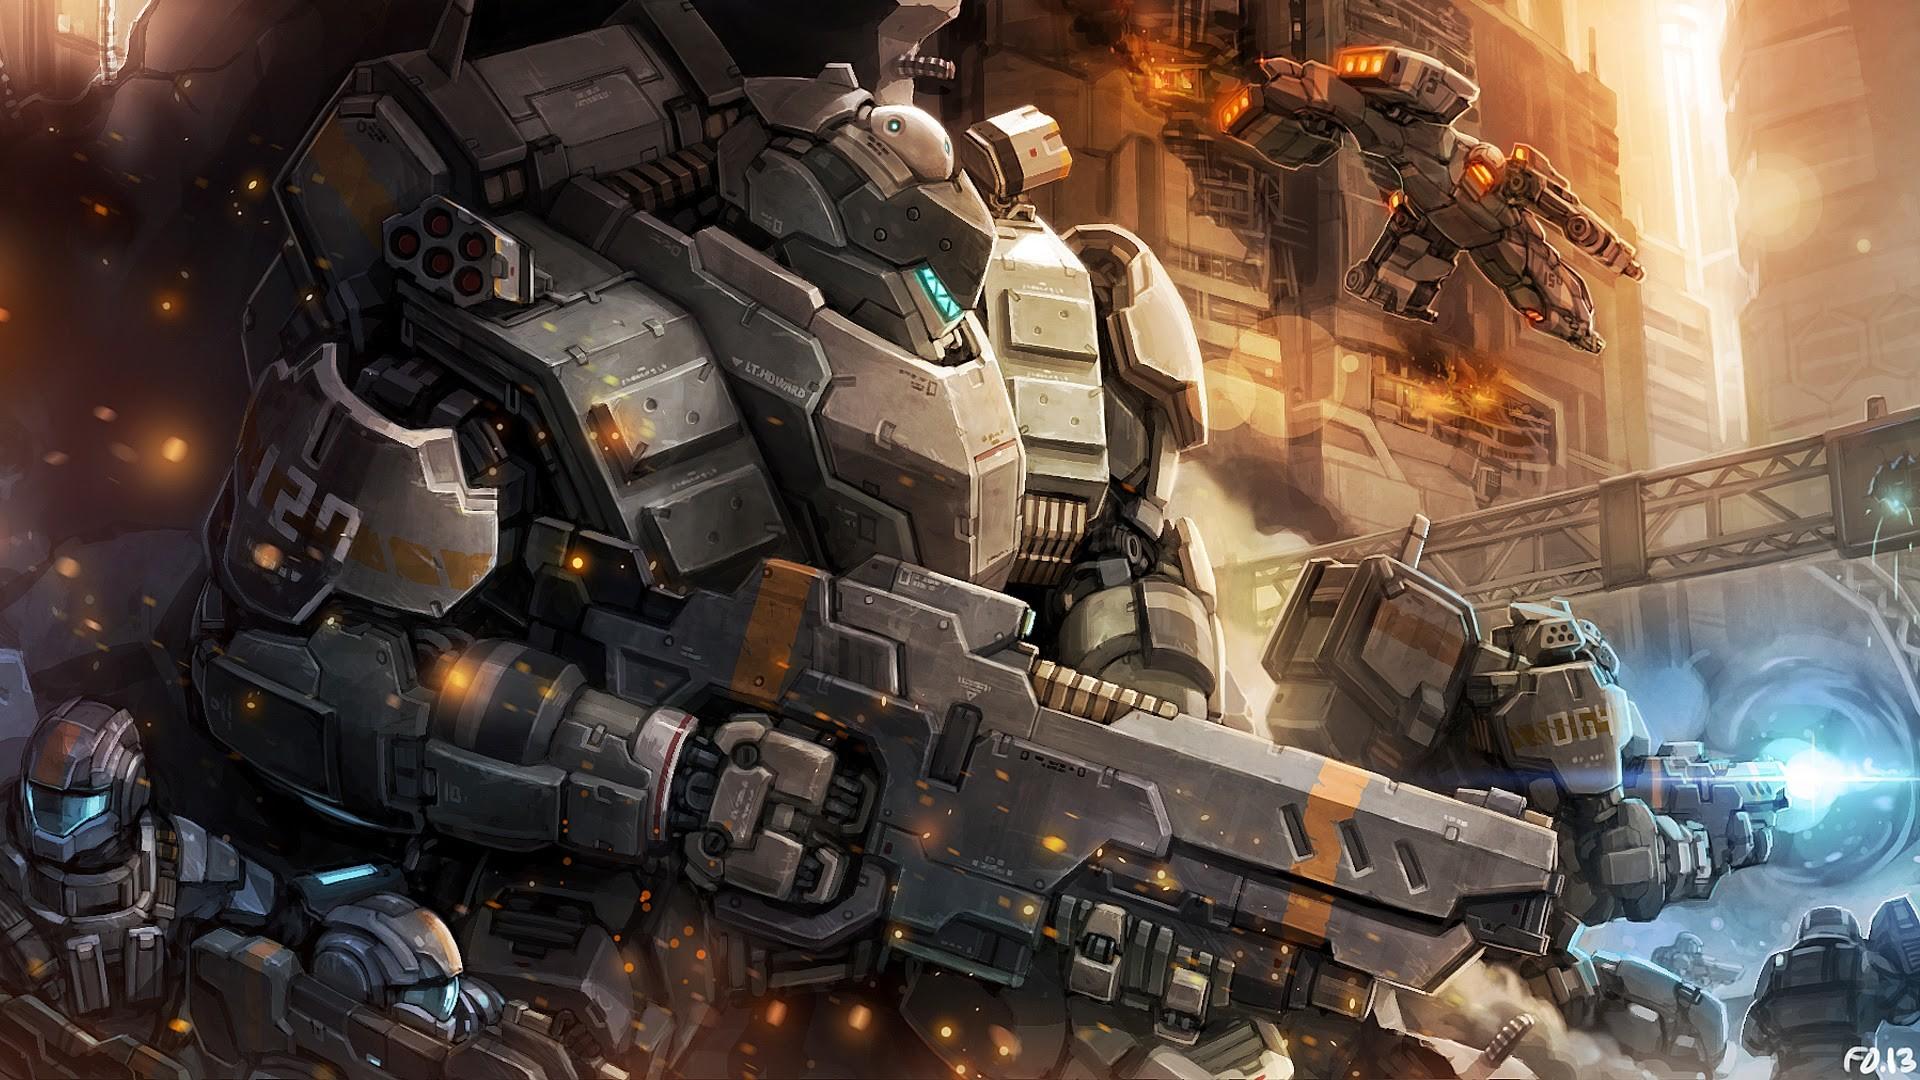 Image – Mecha-soldier-weapon-armor-sci-fi-original-hd-wallpaper-20151201002332-565ce8845e2ce.jpg    Legends of the Multi Universe Wiki   FANDOM powered by …